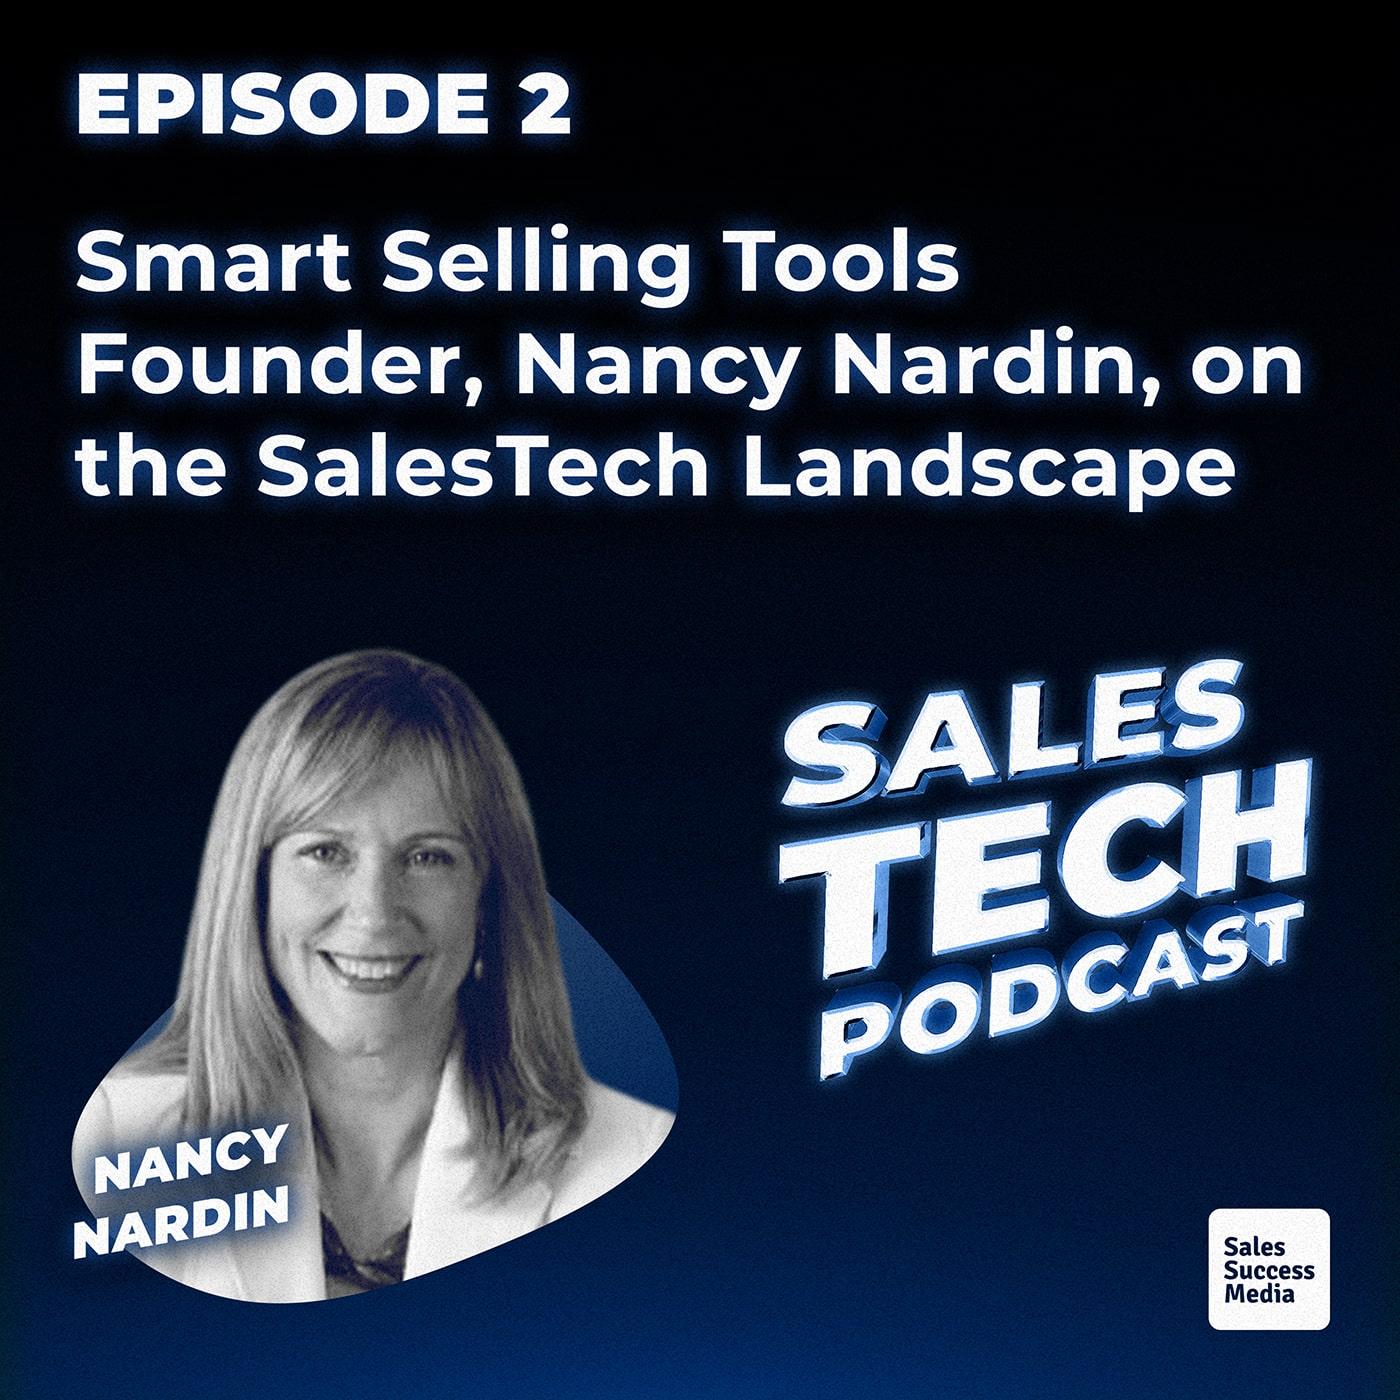 2: Smart Selling Tools Founder, Nancy Nardin, on the SalesTech Landscape